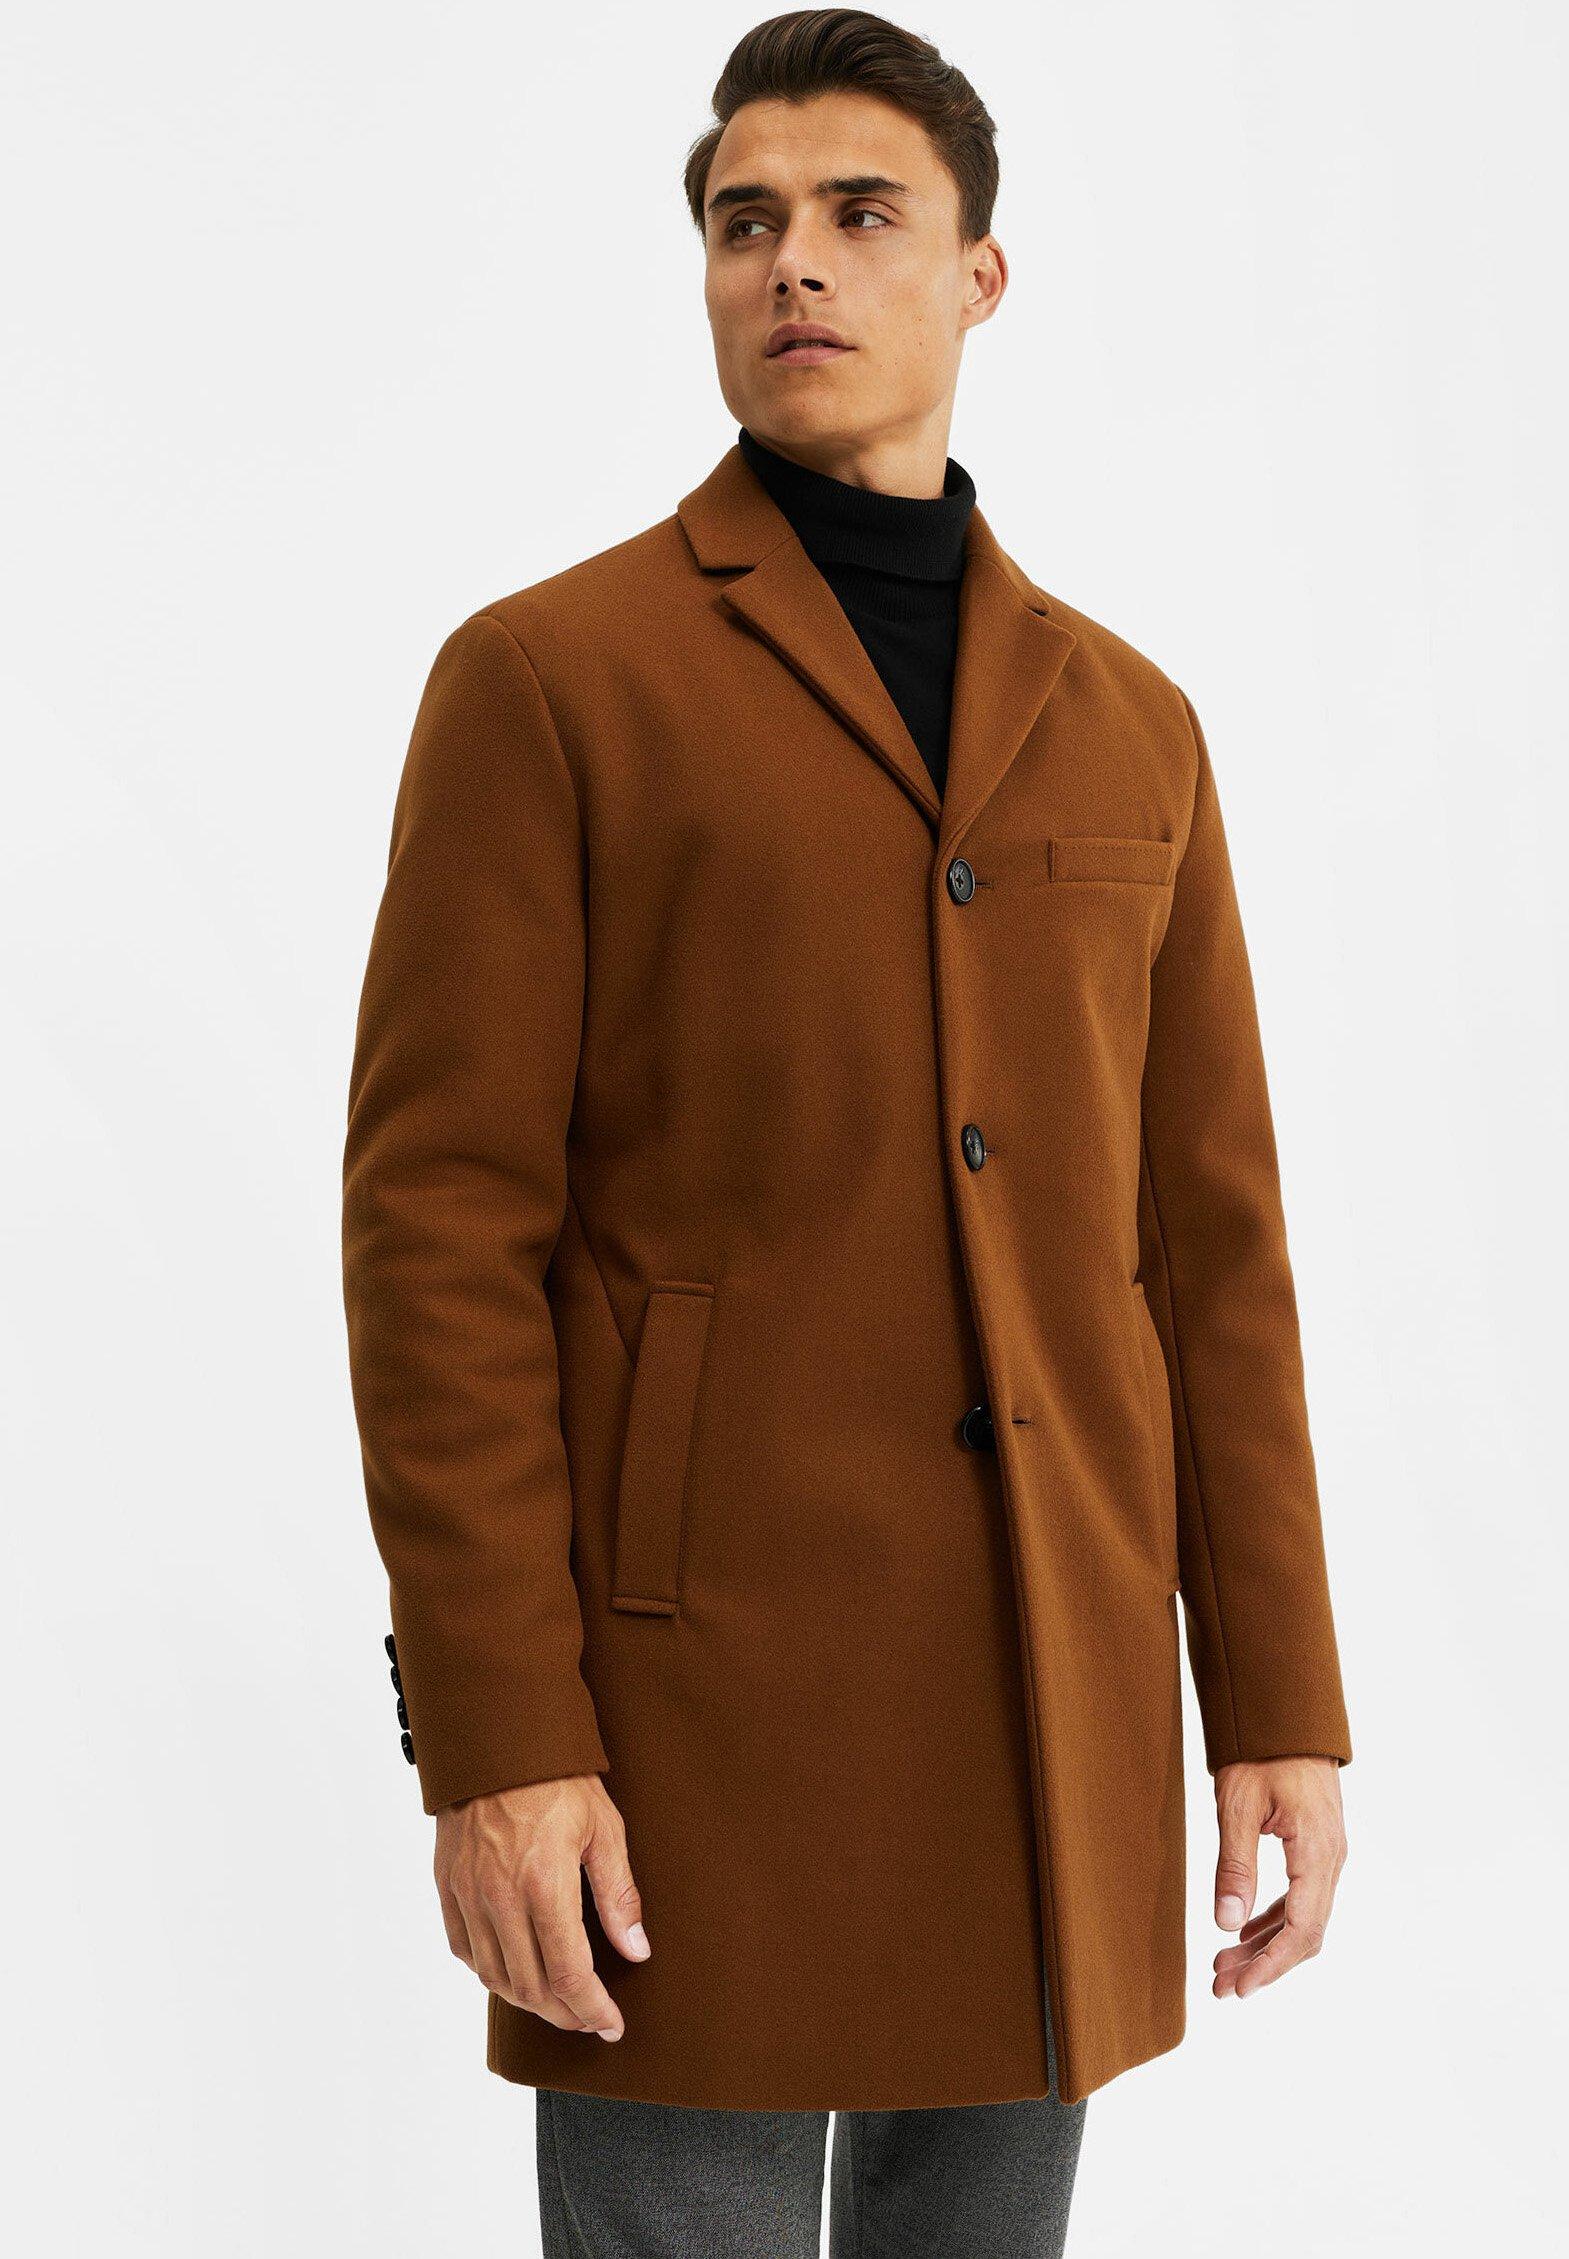 MANTEAU SLIM FIT HOMME | 79974493 WE Fashion